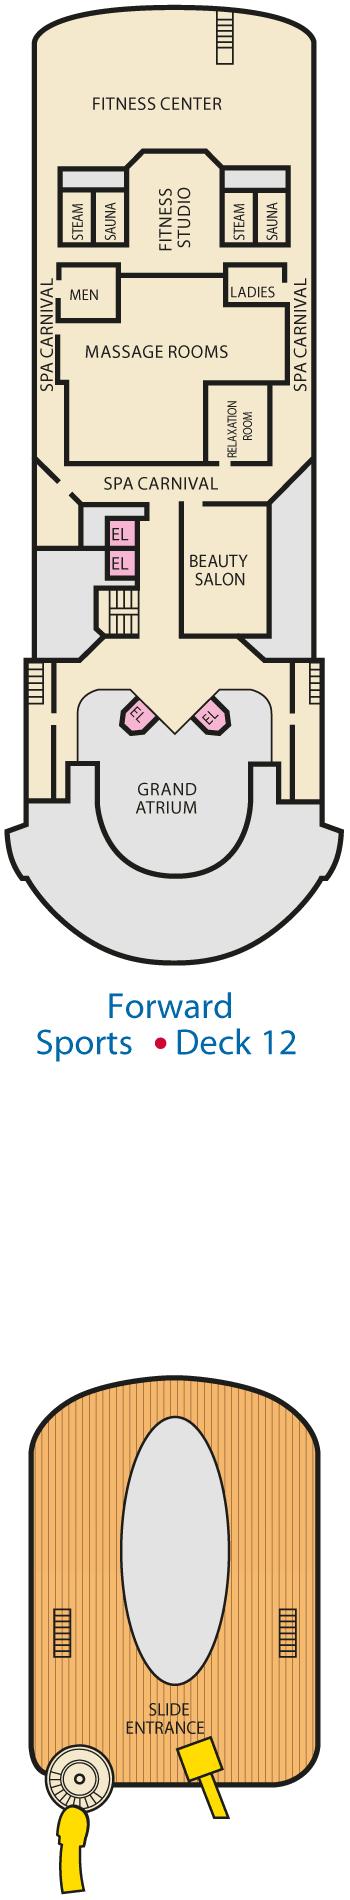 Carnival Inspiration - Sports Deck